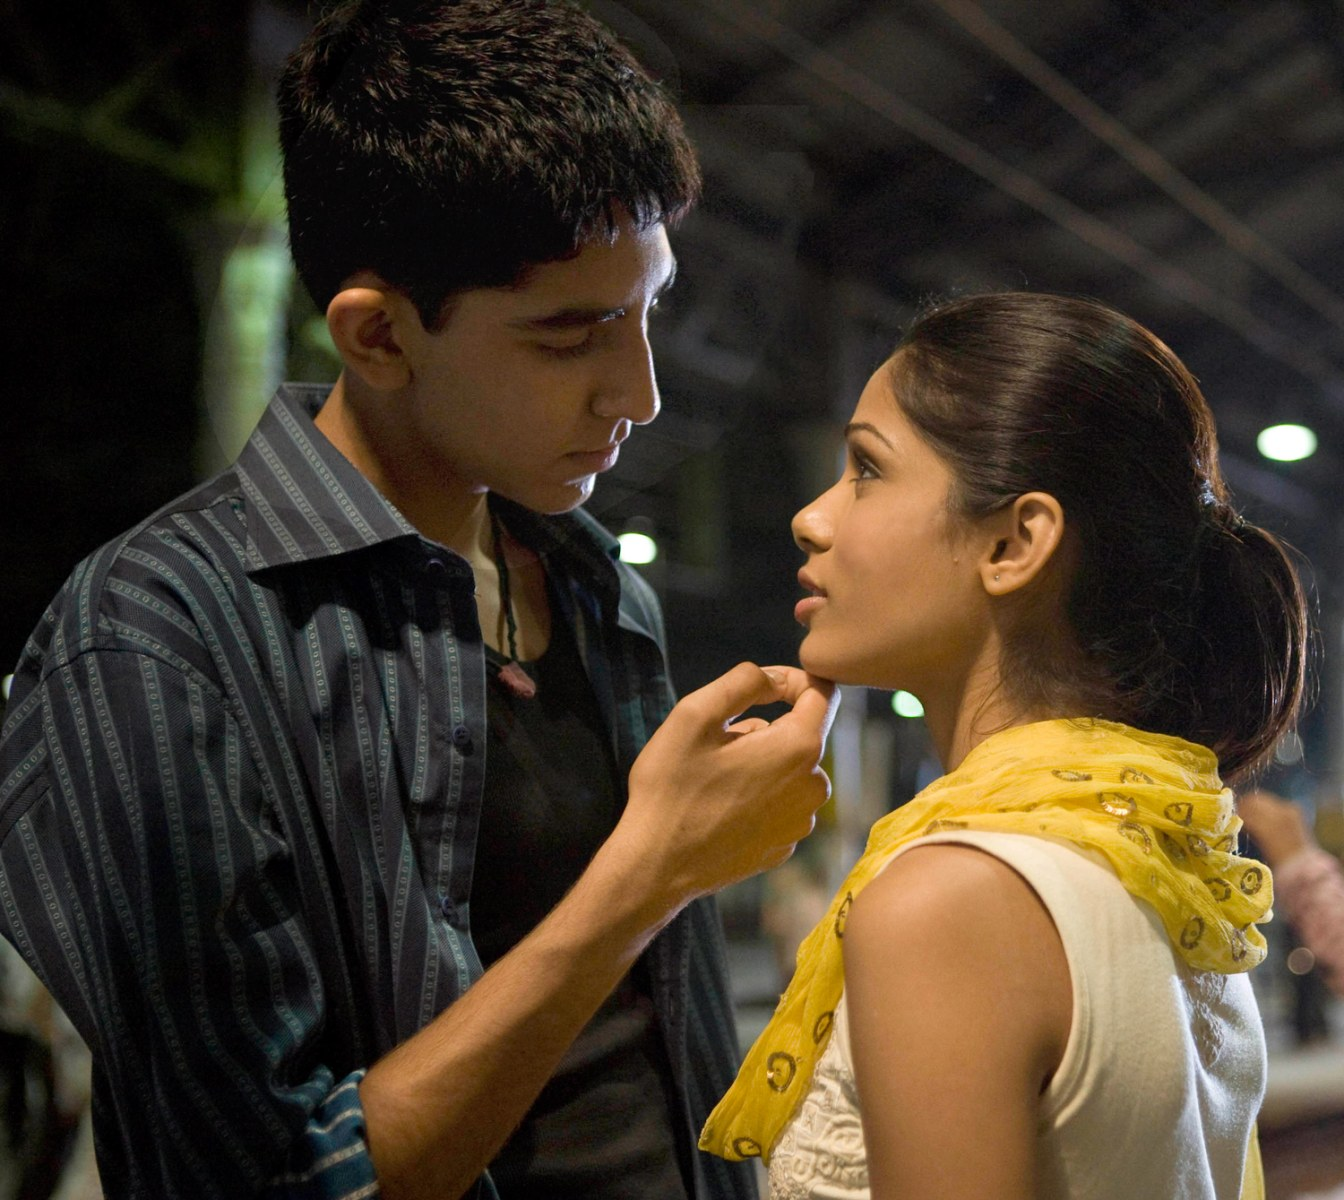 romantic movies millionaire slumdog most today patel 2008 movie jamal film latika dev times story millonario quiere quien ser ever